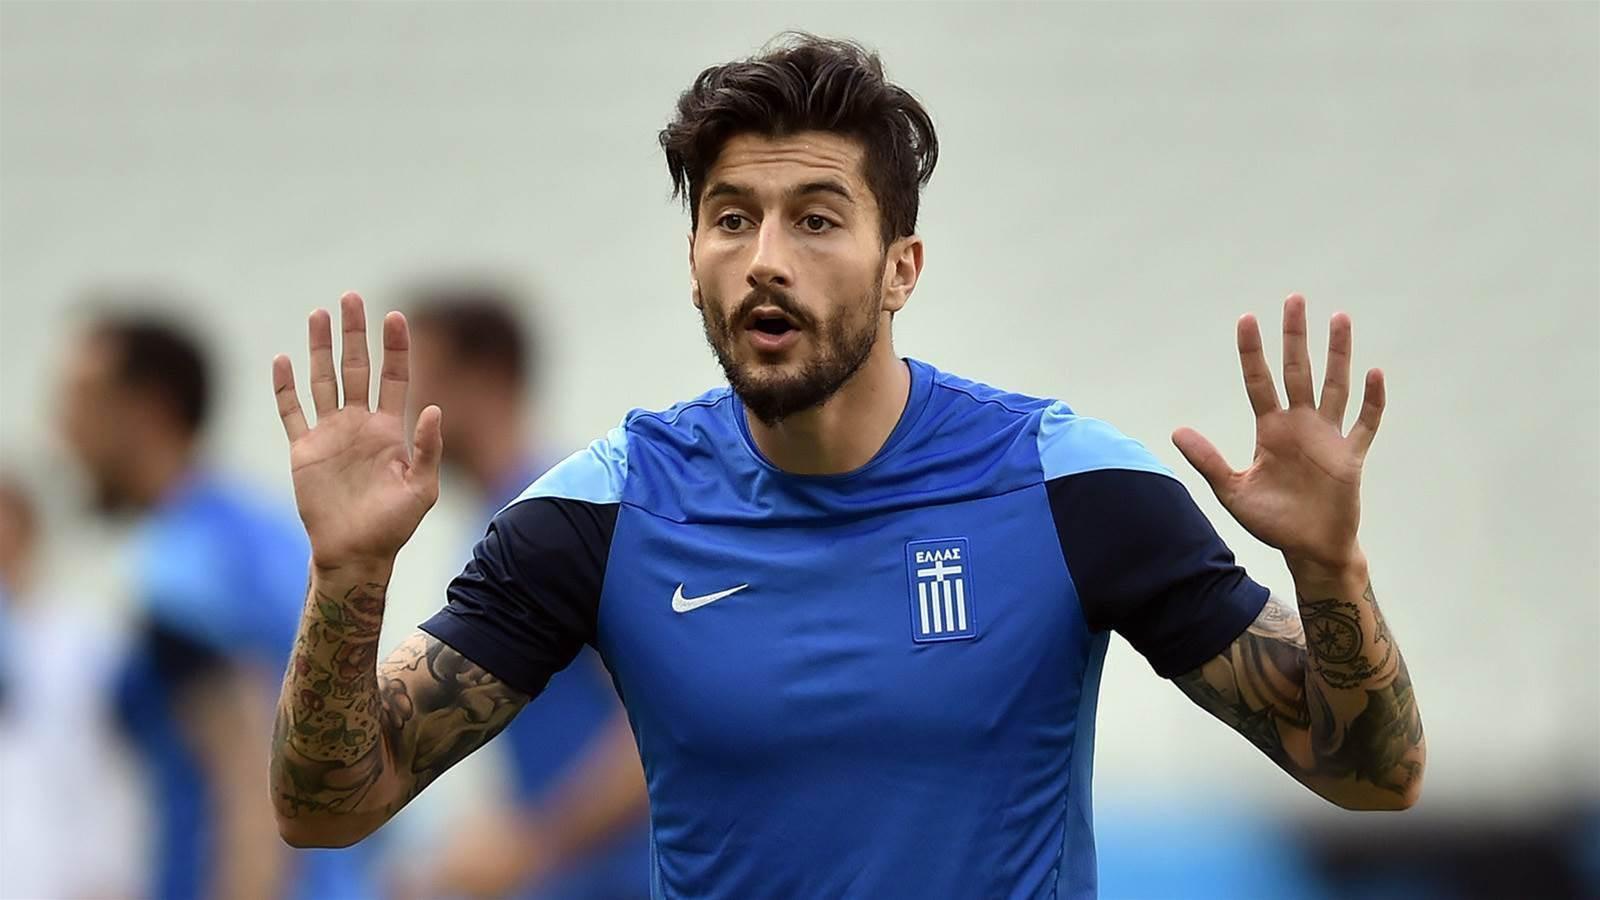 Kone 'outstanding' choice for A-League, says Italian club